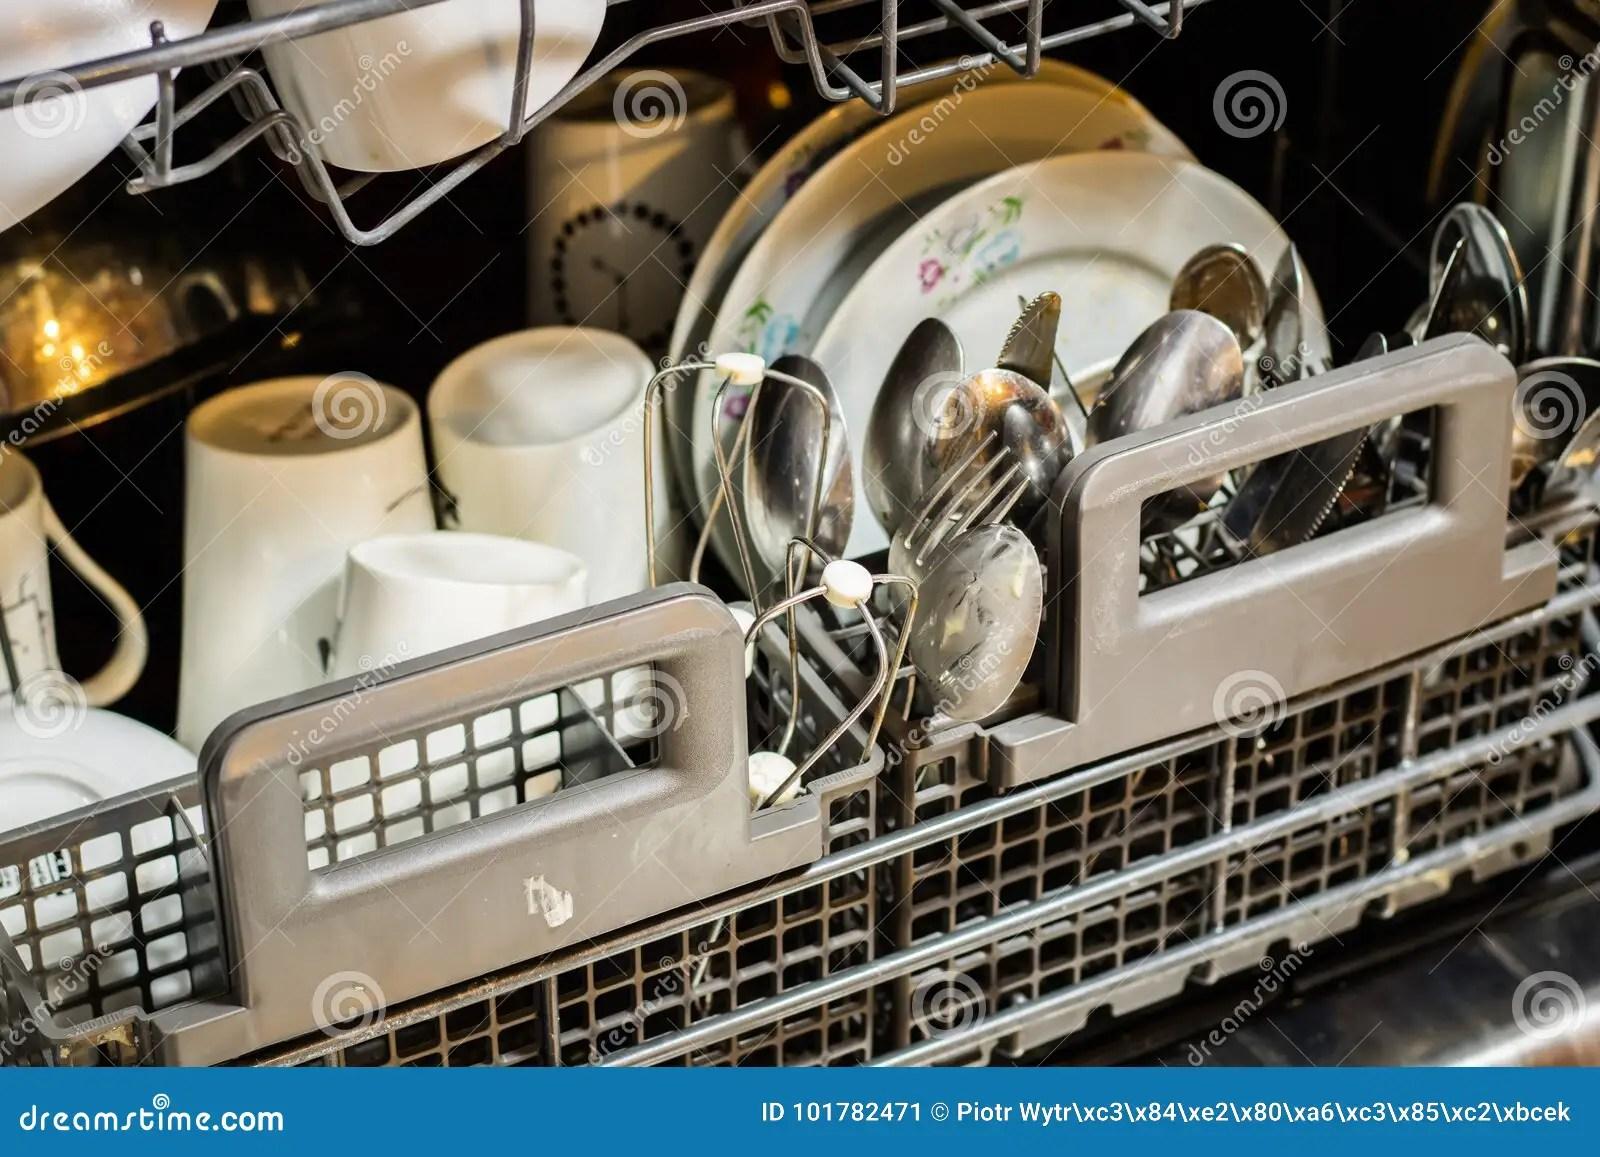 kitchen aid bowls tray 有坏的盘的洗碗机粉末 洗碗盘行为片剂和rin 库存图片 图片包括有包装 洗碗盘行为片剂和冲洗援助洗涤的盘在厨房里